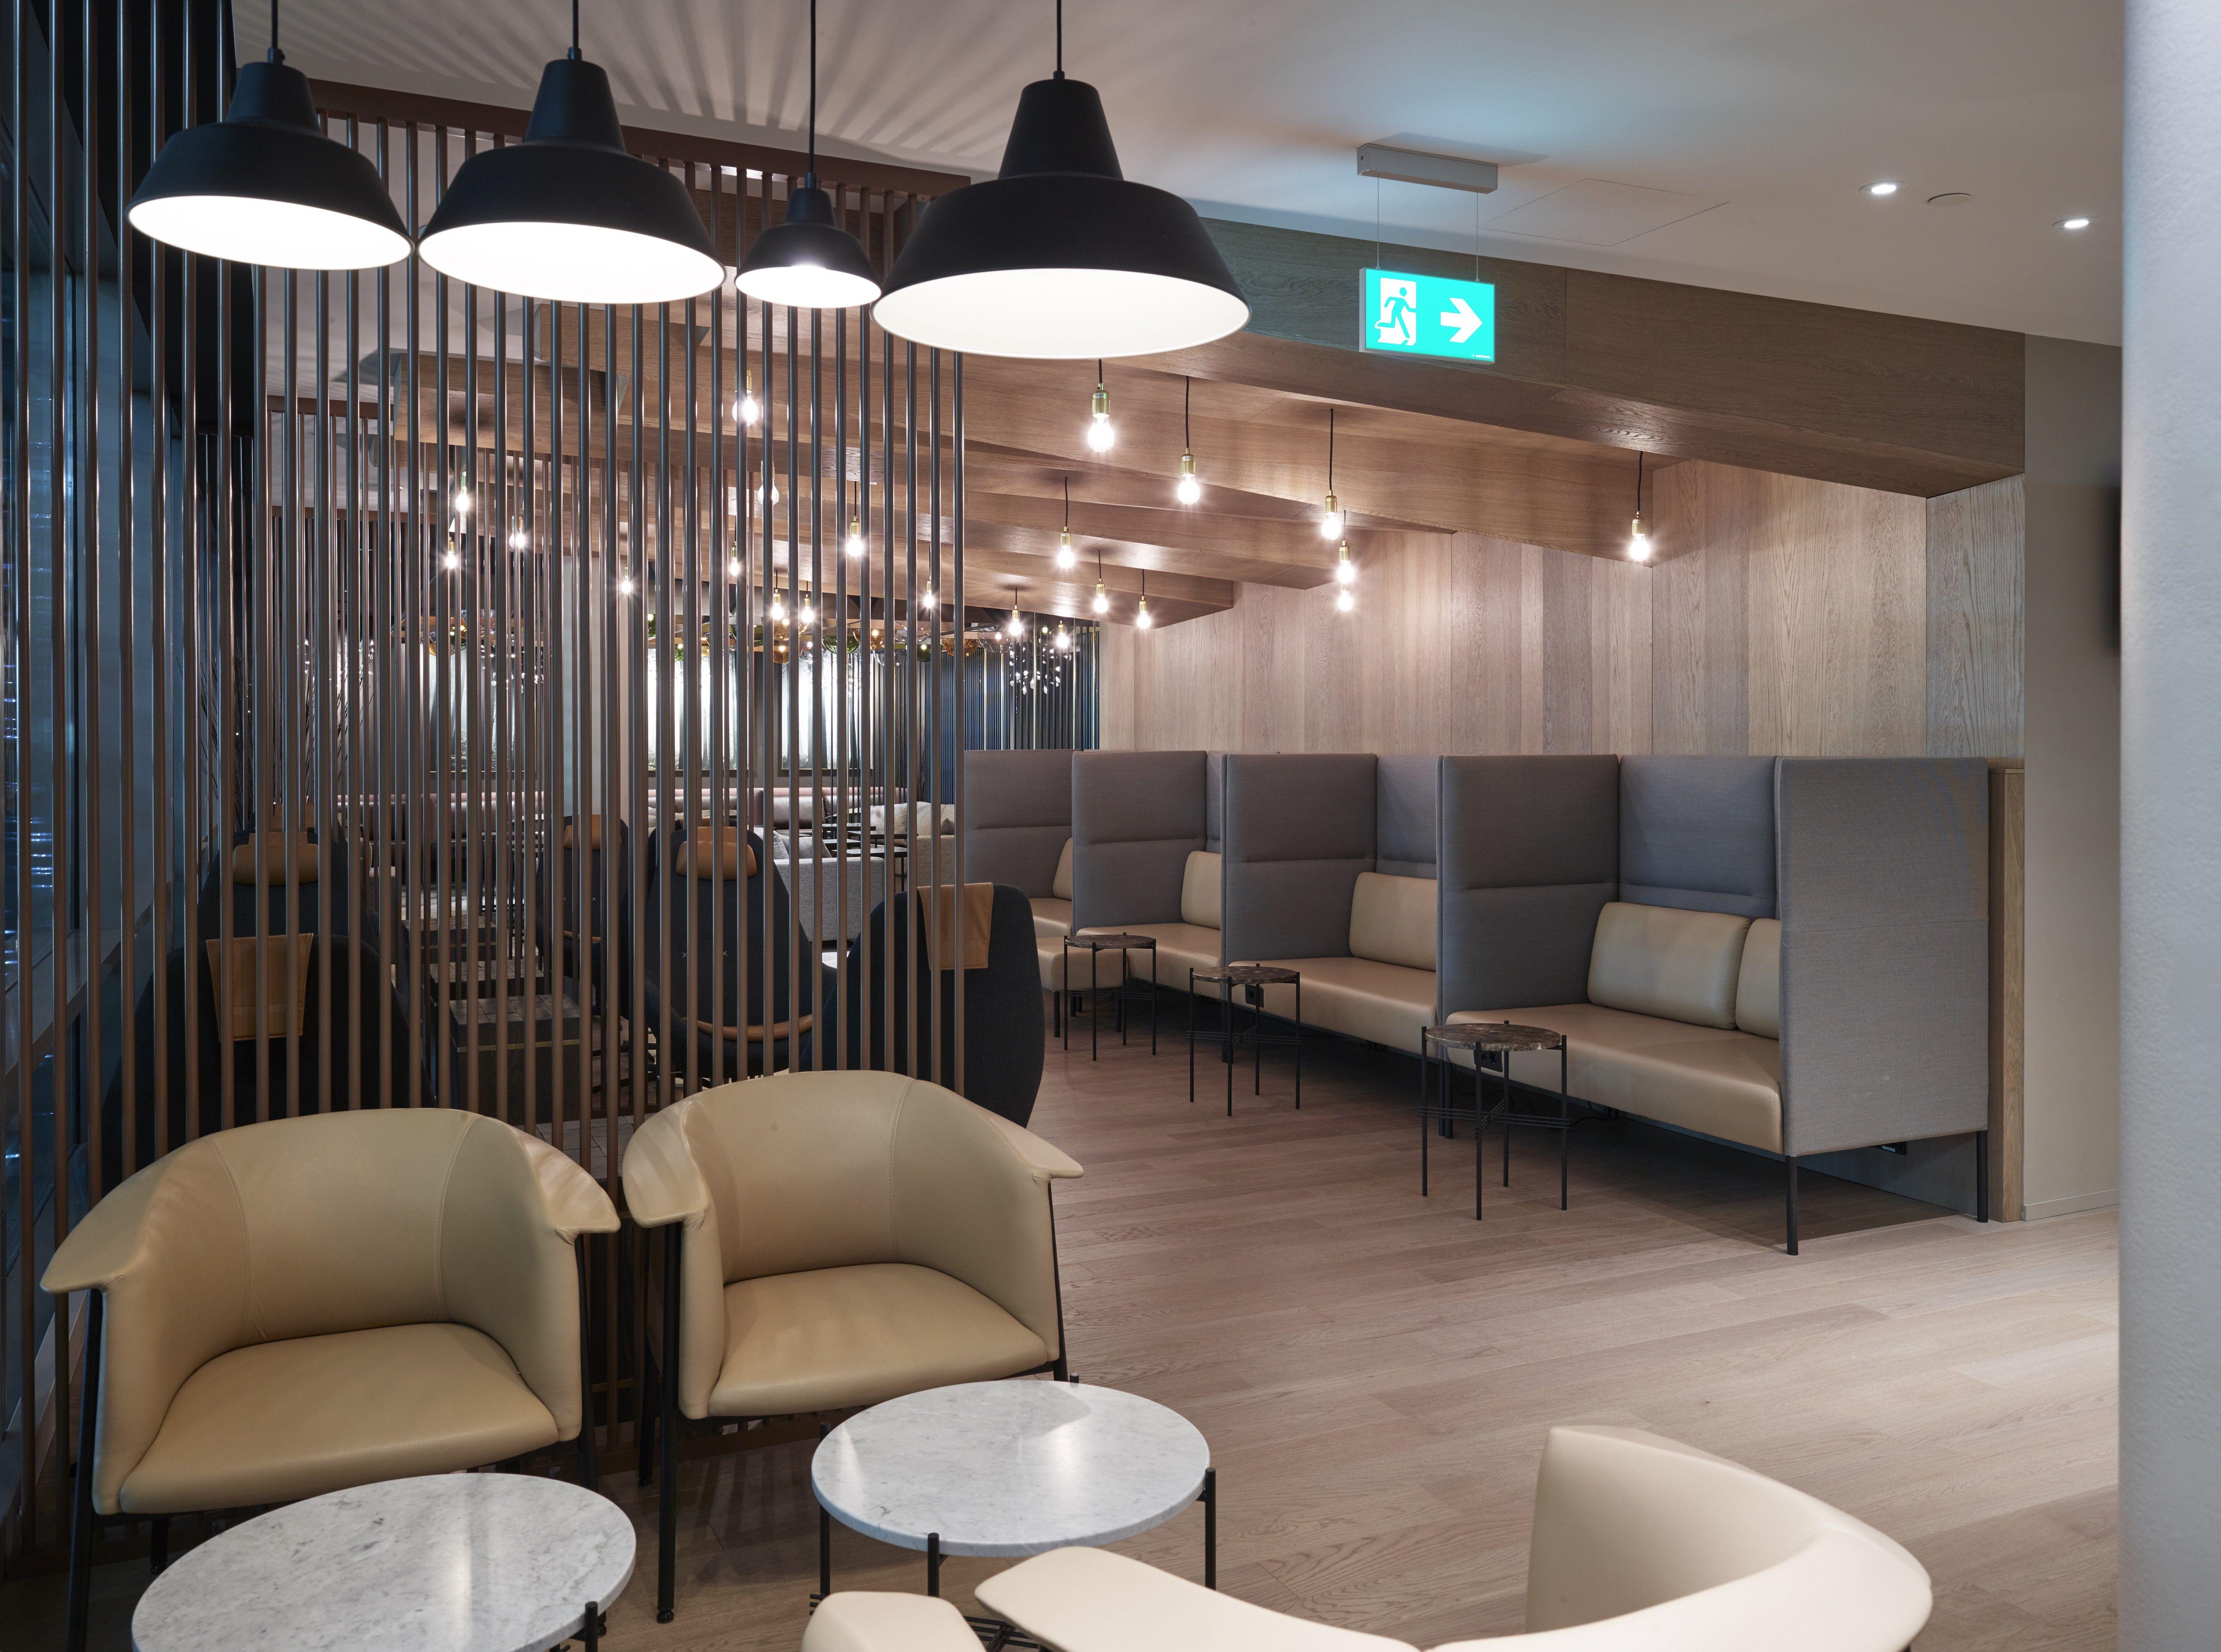 Best 25+ Airport lounge ideas on Pinterest | Commercial design ...